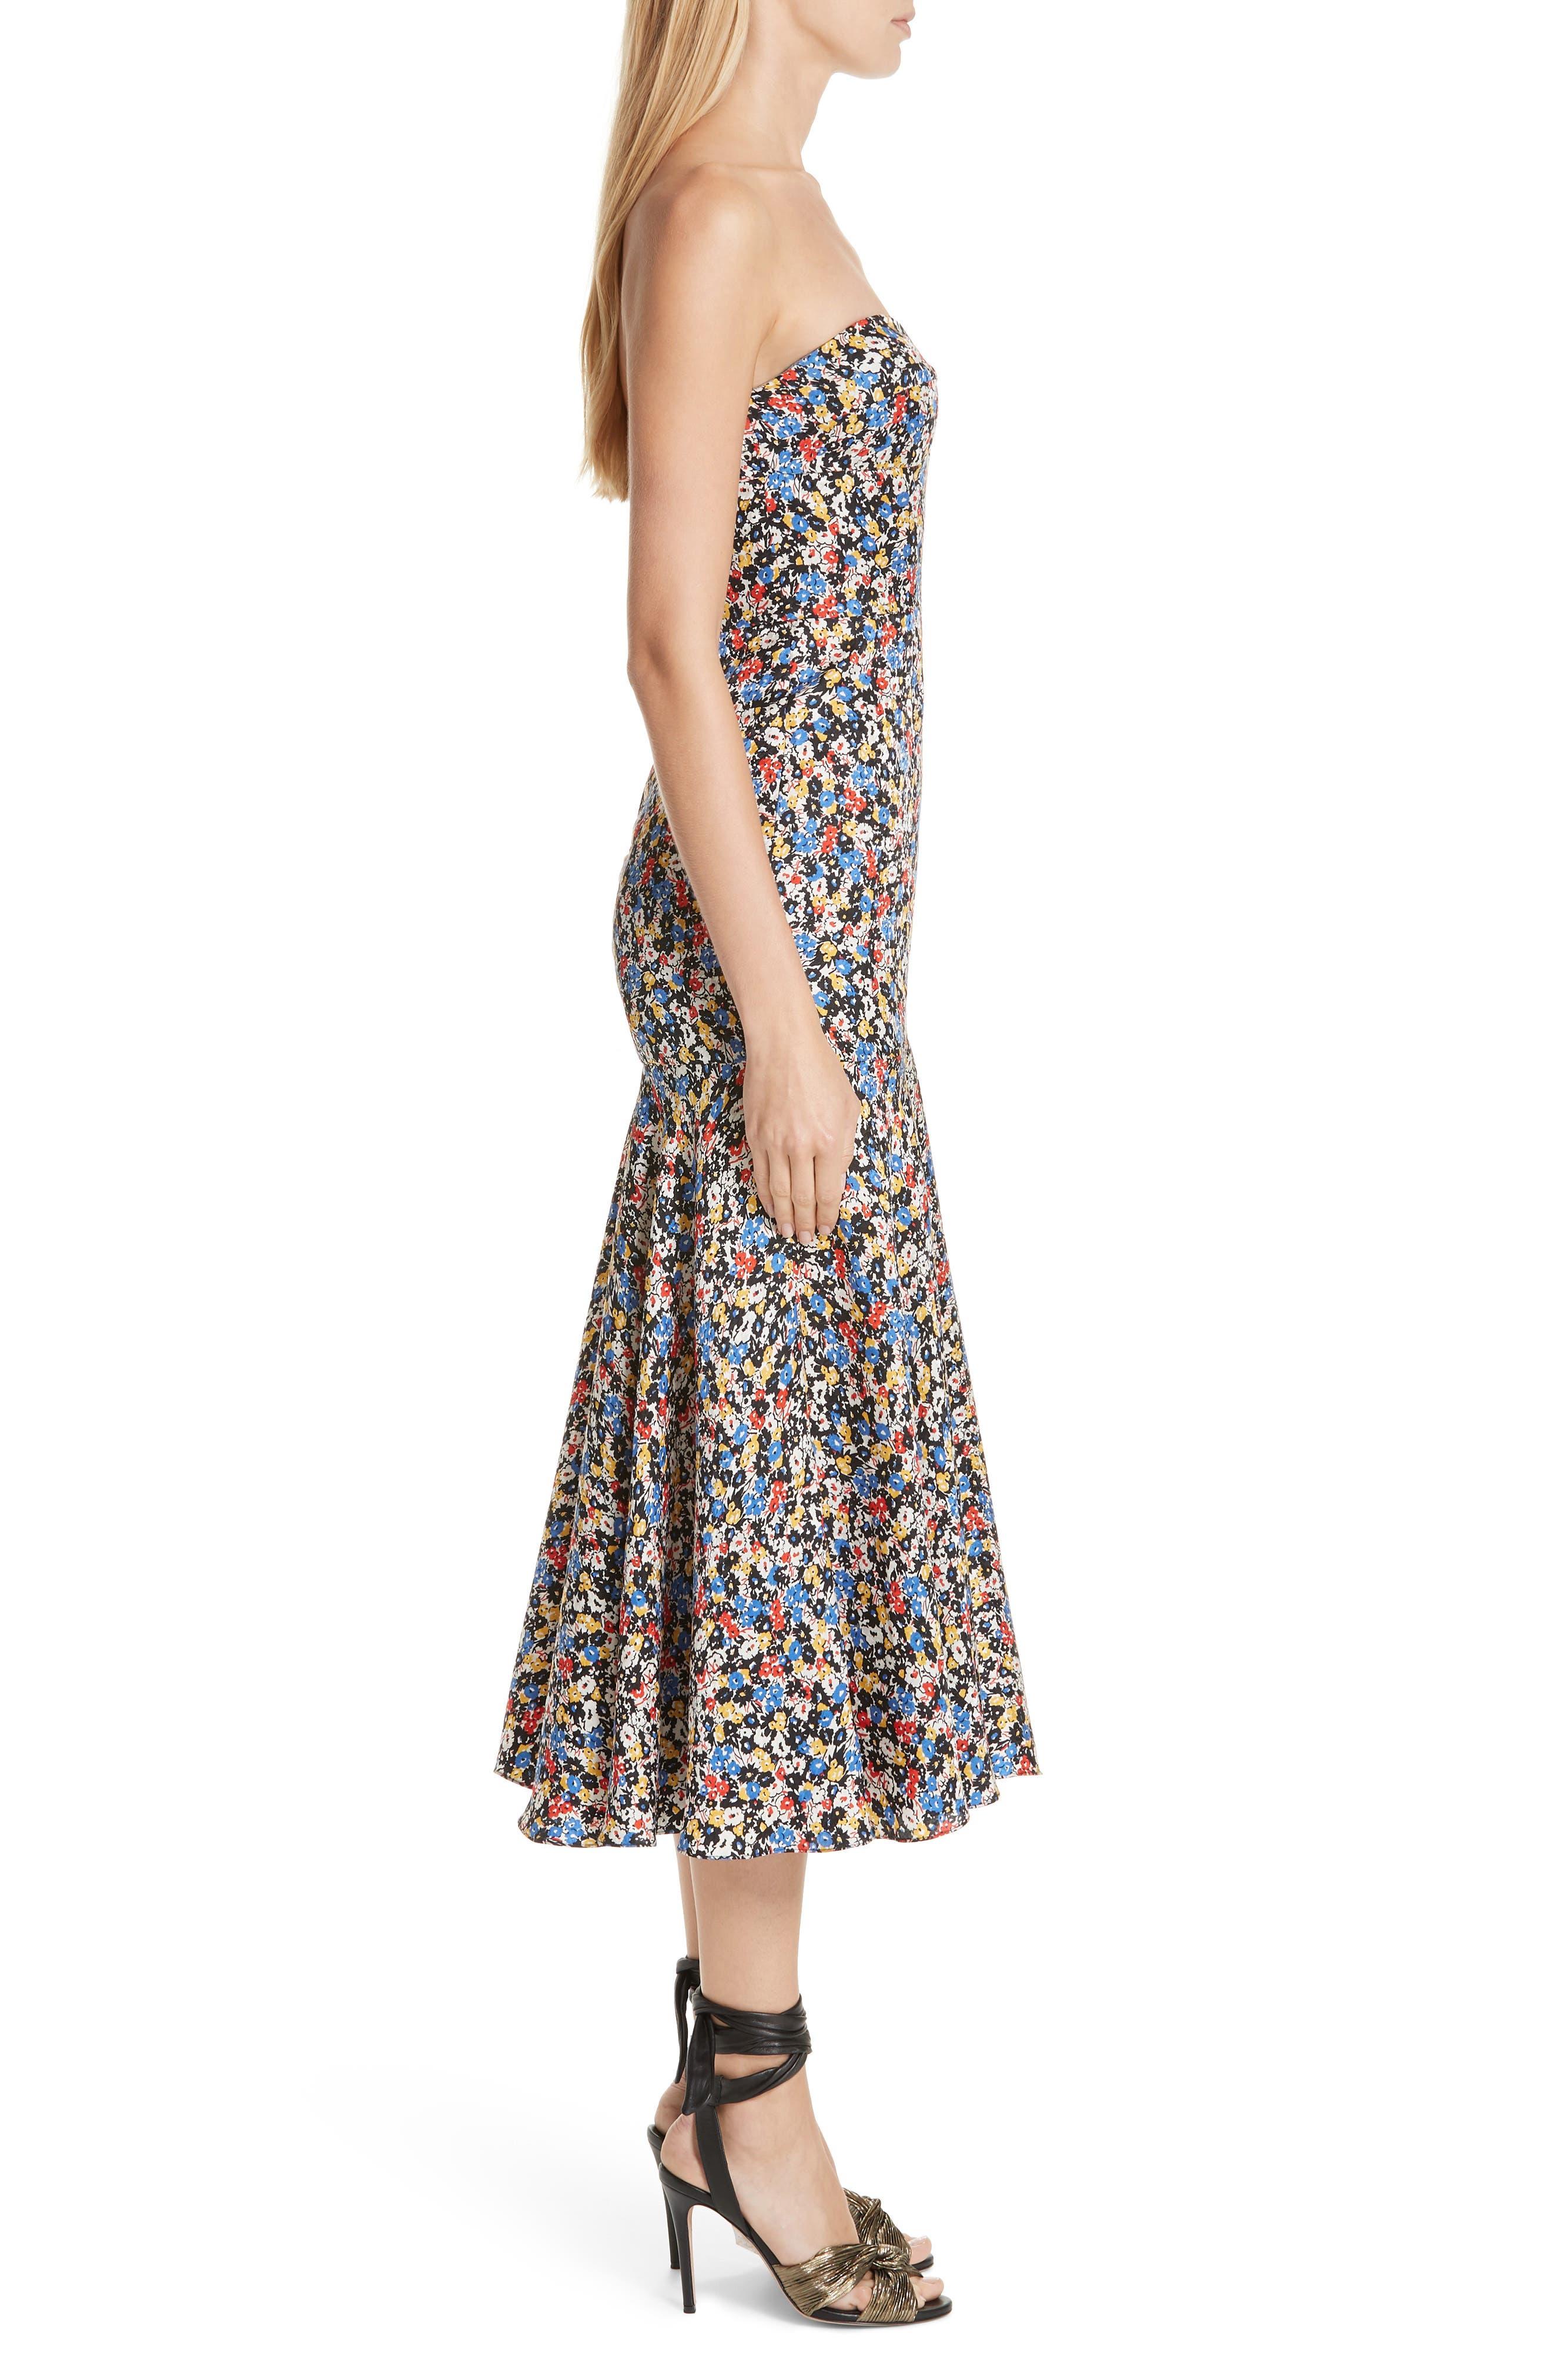 Annika Floral Print Strapless Stretch Silk Dress,                             Alternate thumbnail 3, color,                             966